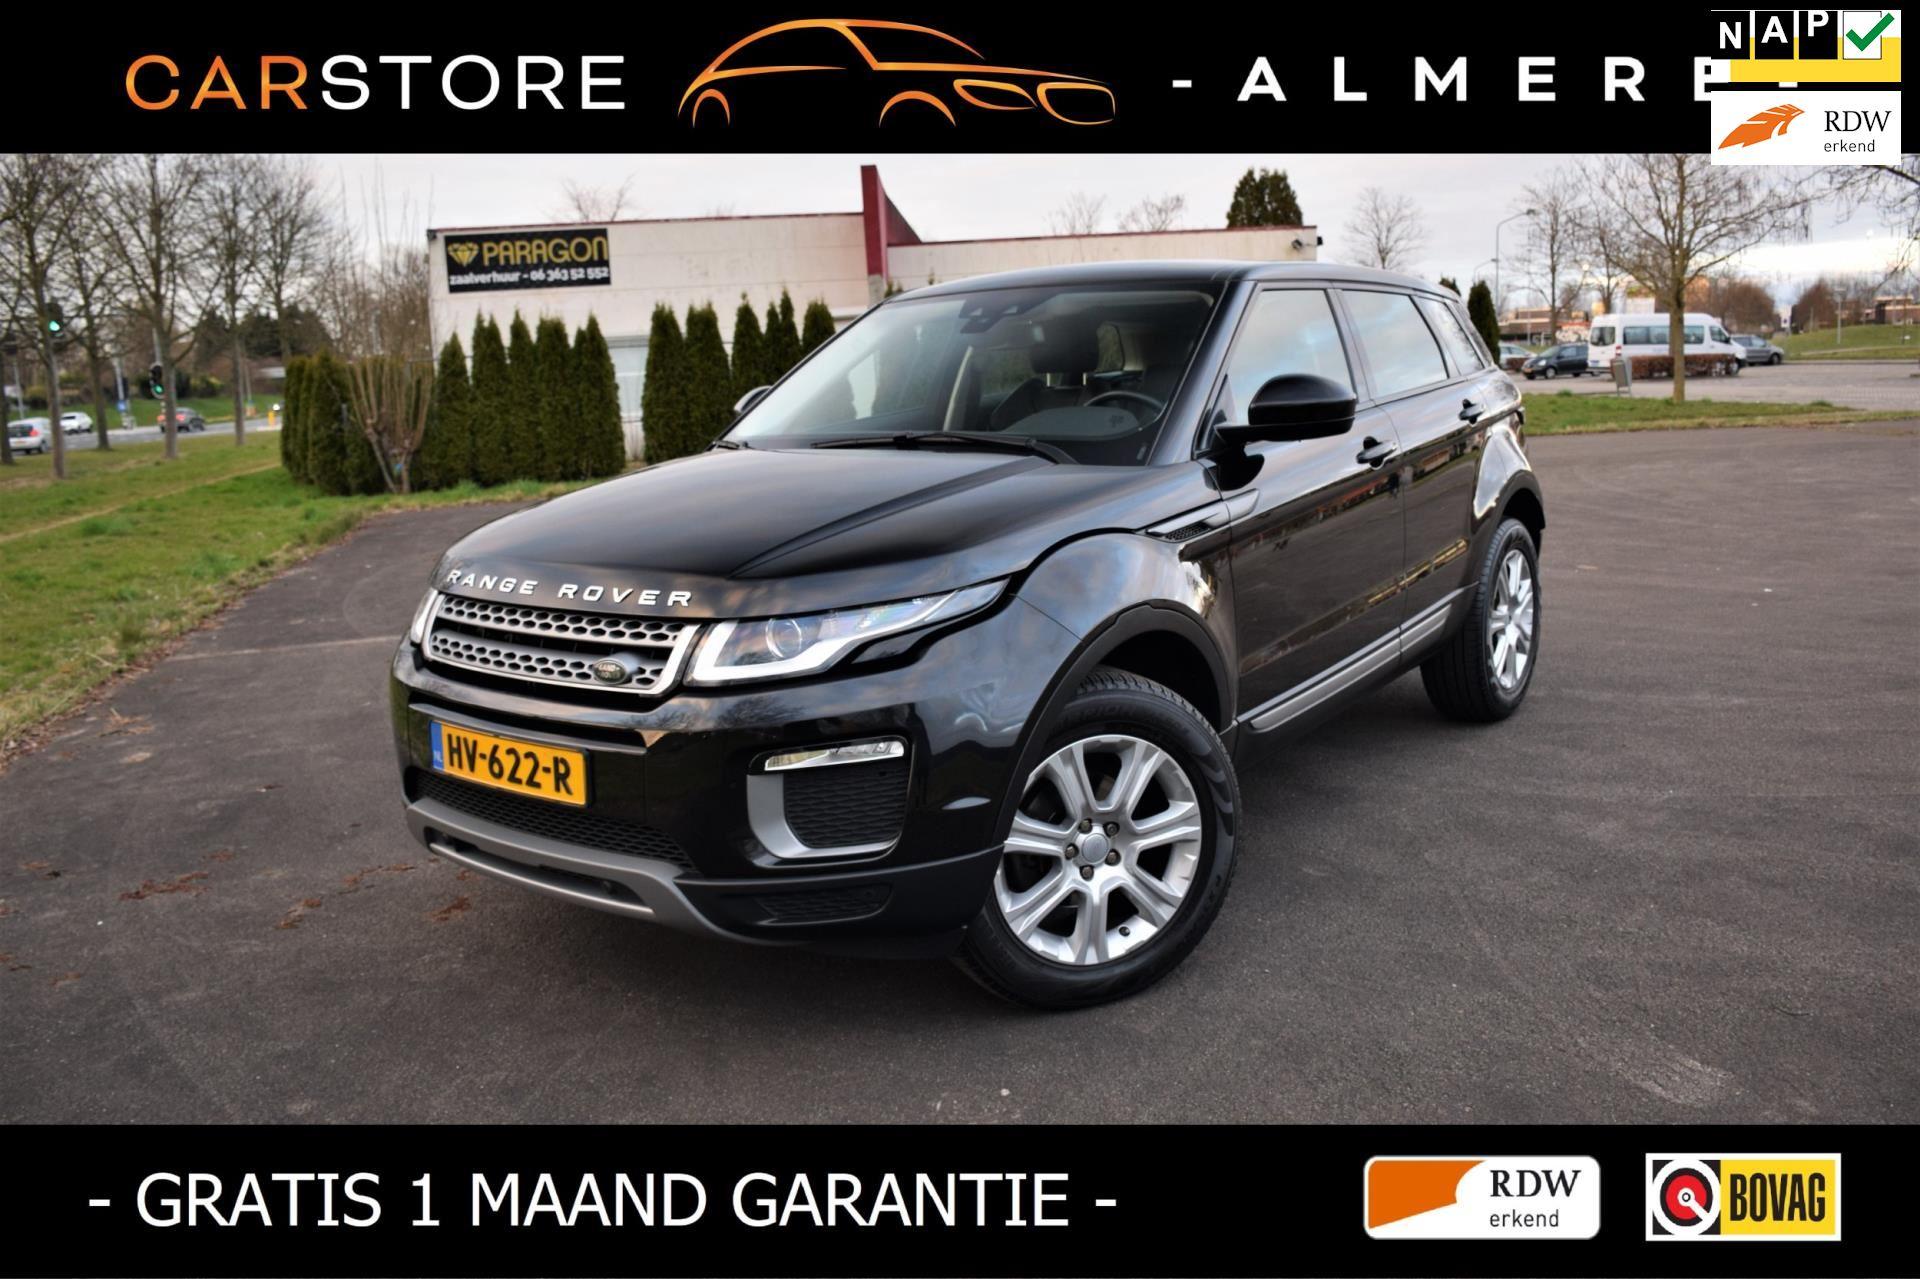 Land Rover Range Rover Evoque occasion - Used Car Store Almere